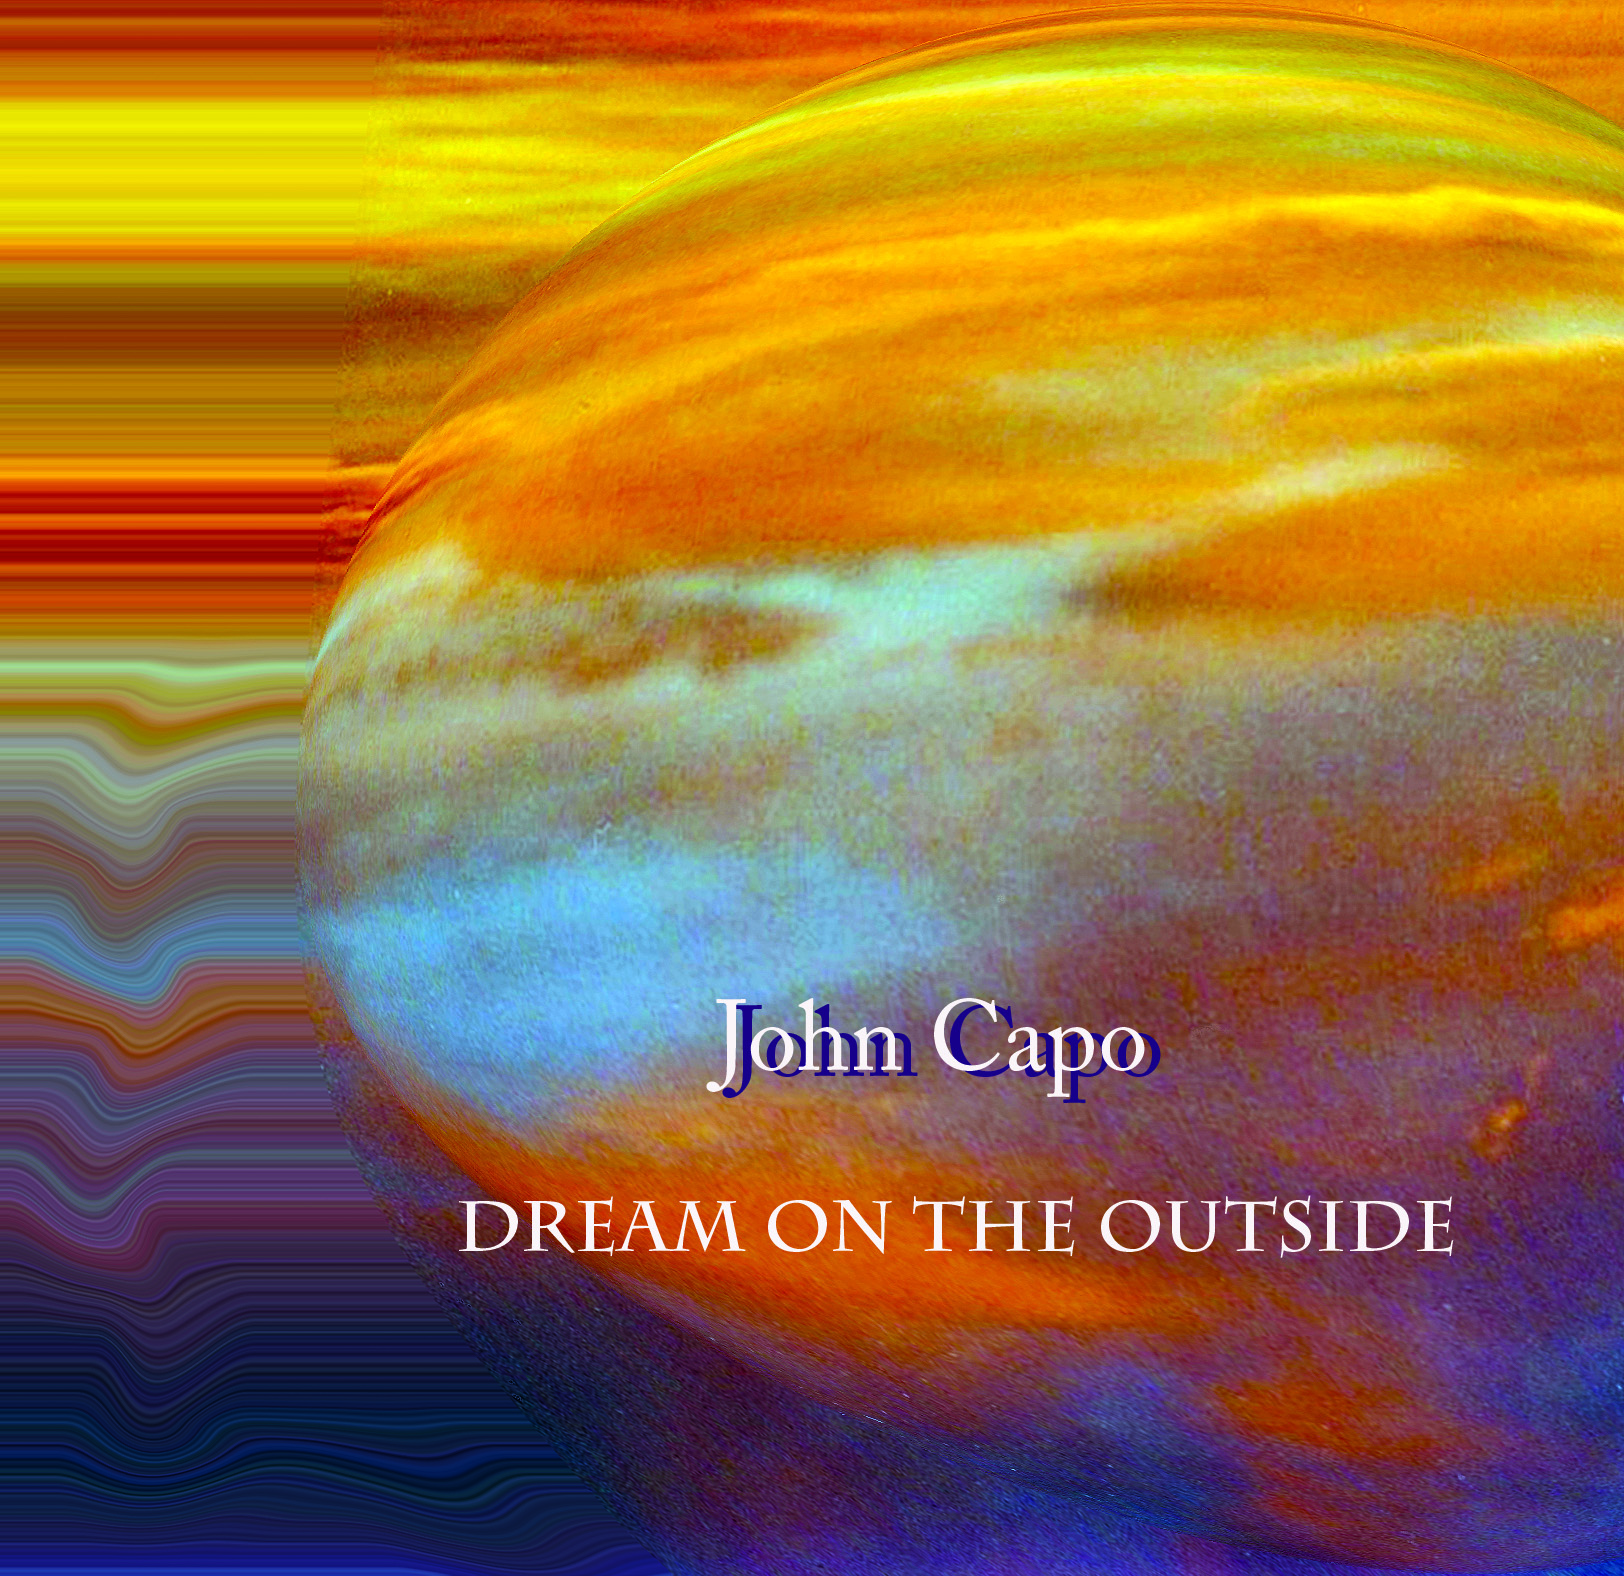 John Capo